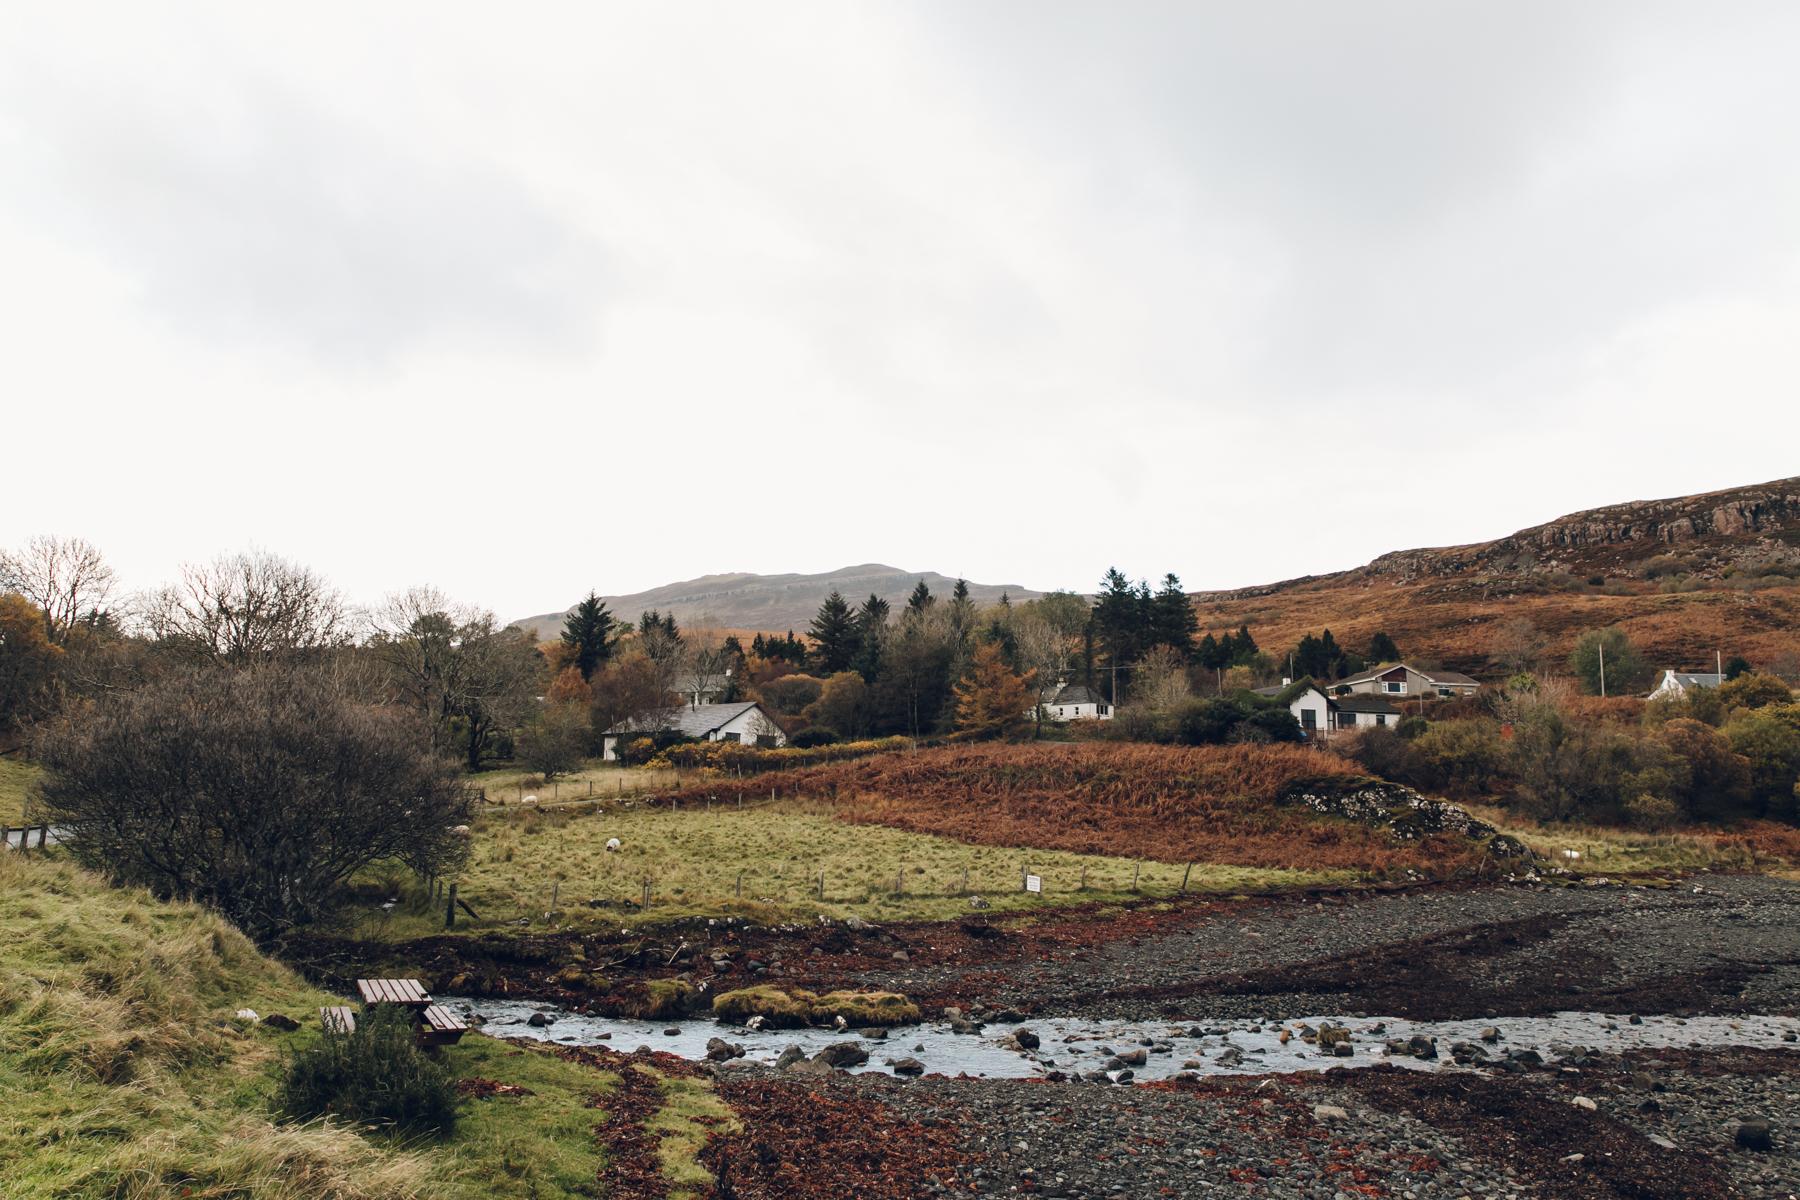 Houses overlooking Camustianavaig Bay on the Isle of Skye in Scotland.